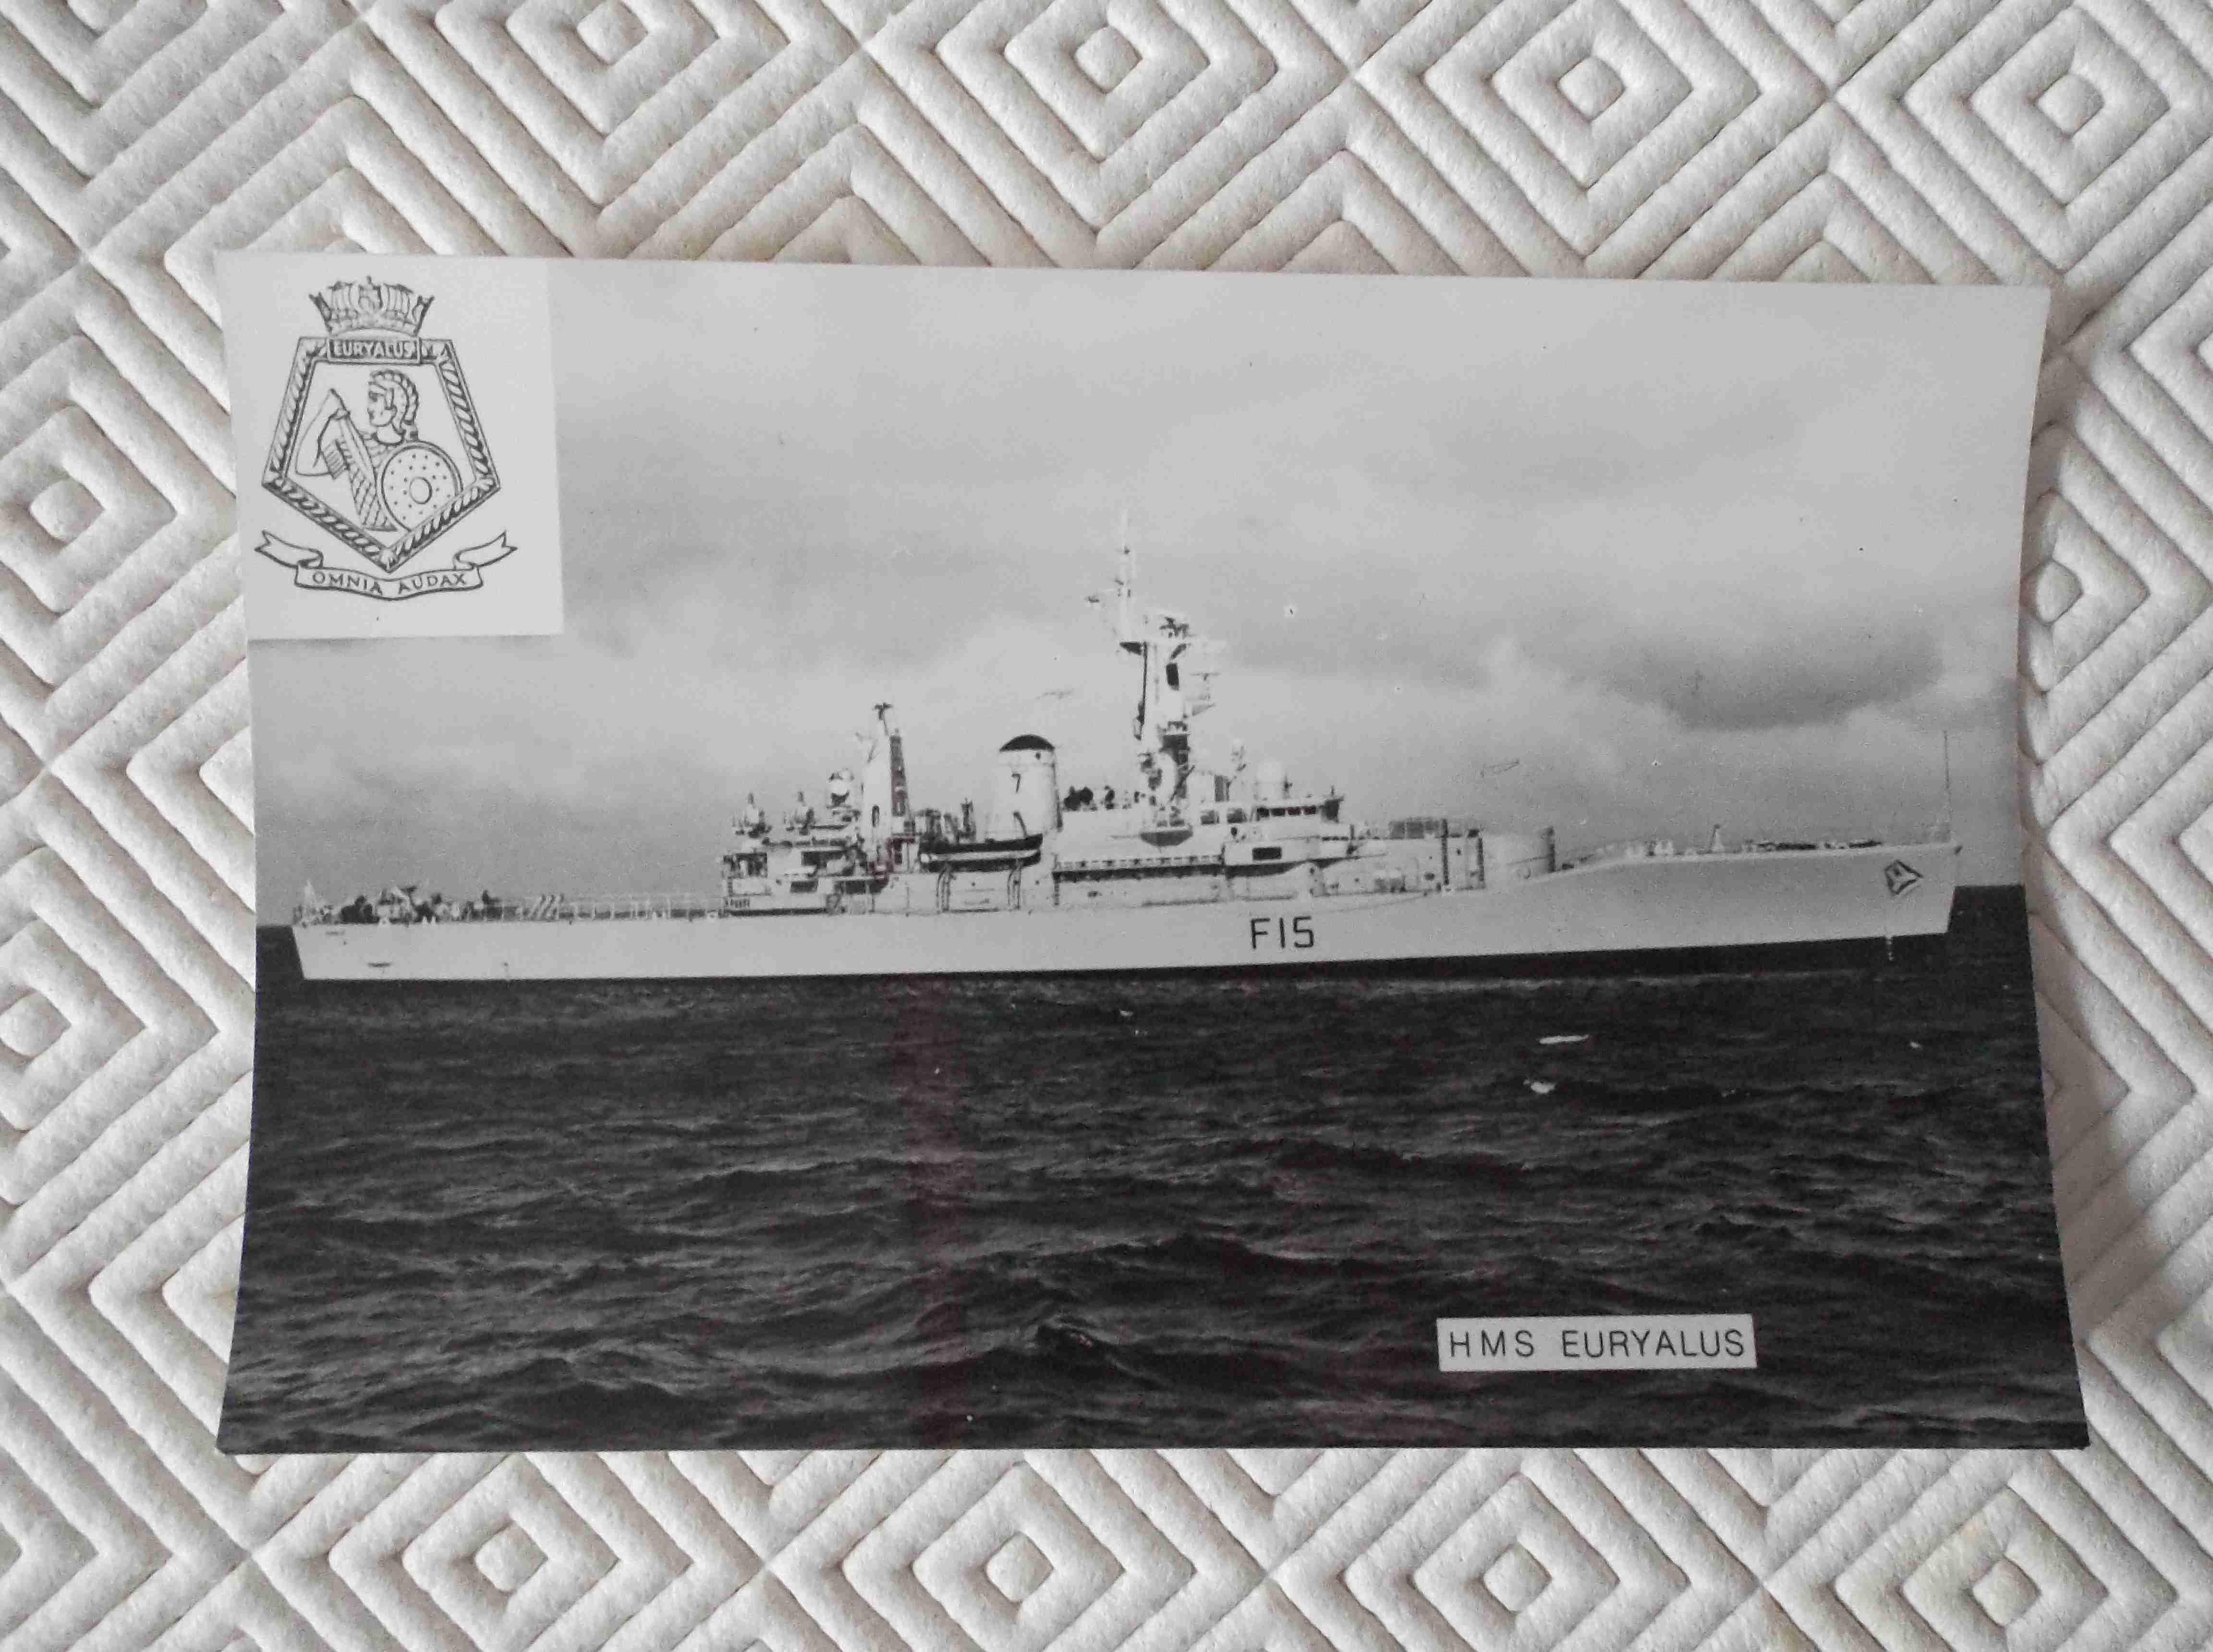 POSTCARD SIZE PHOTOGRAPH OF THE ROYAL NAVAL VESSEL HMS EURYALUS